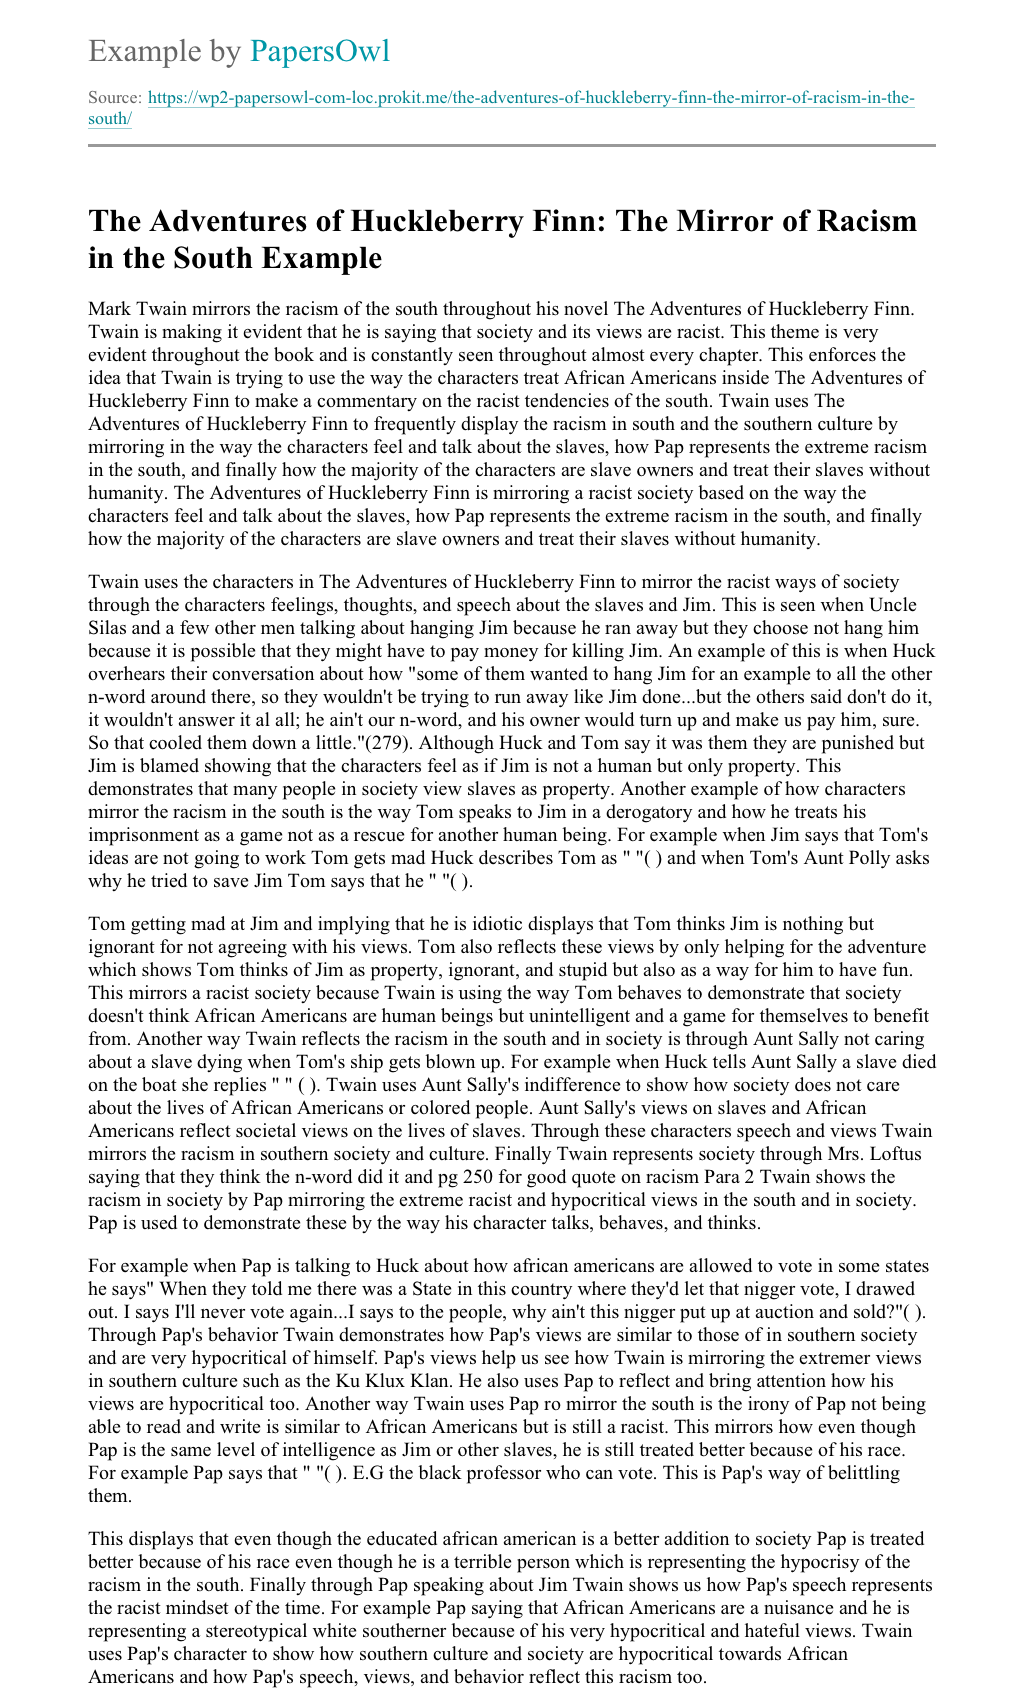 Briar rose essay topics